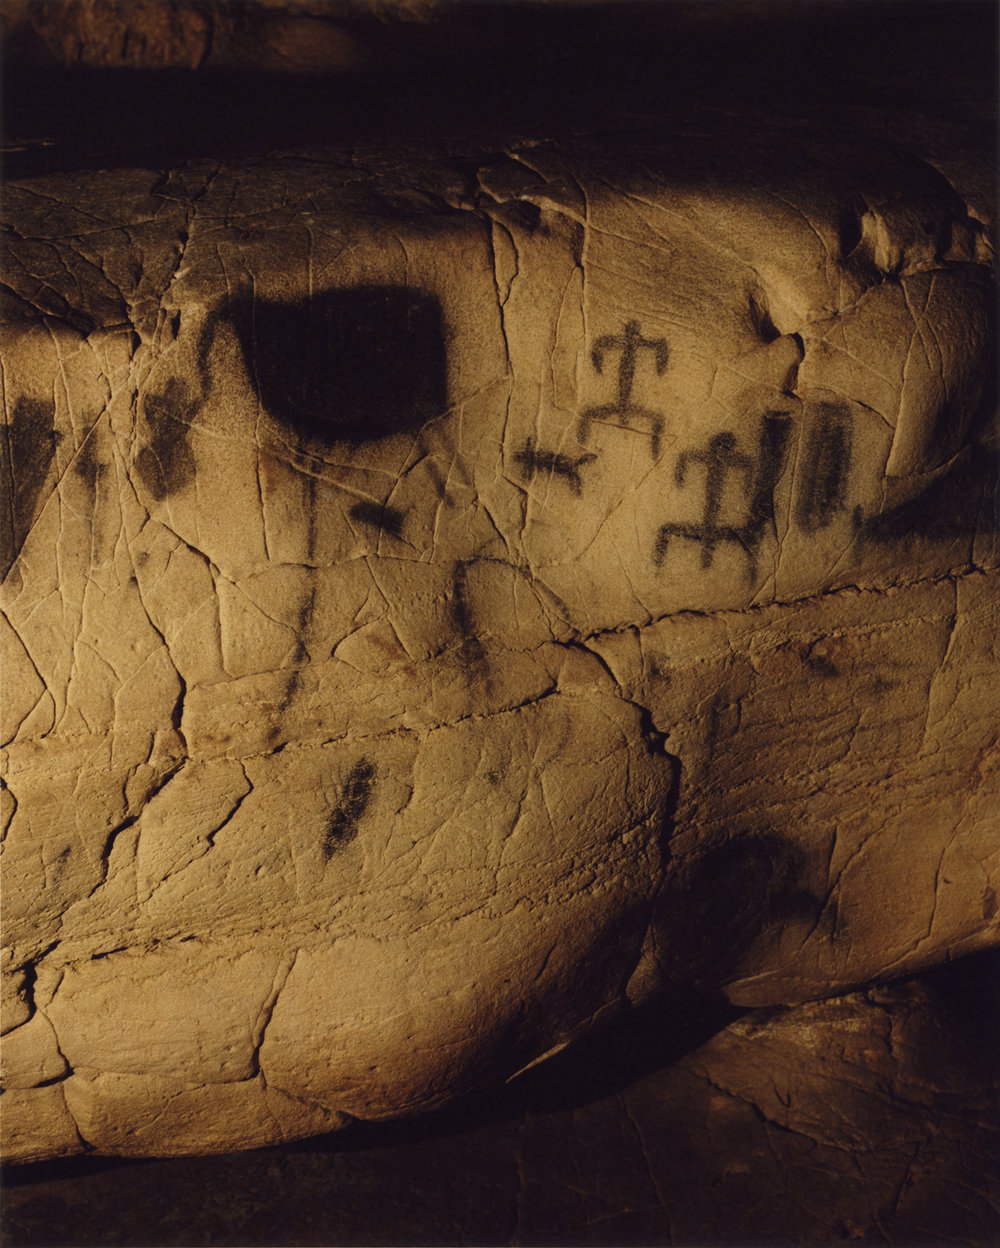 Upper Paleolithic Cave Painting I (2014)